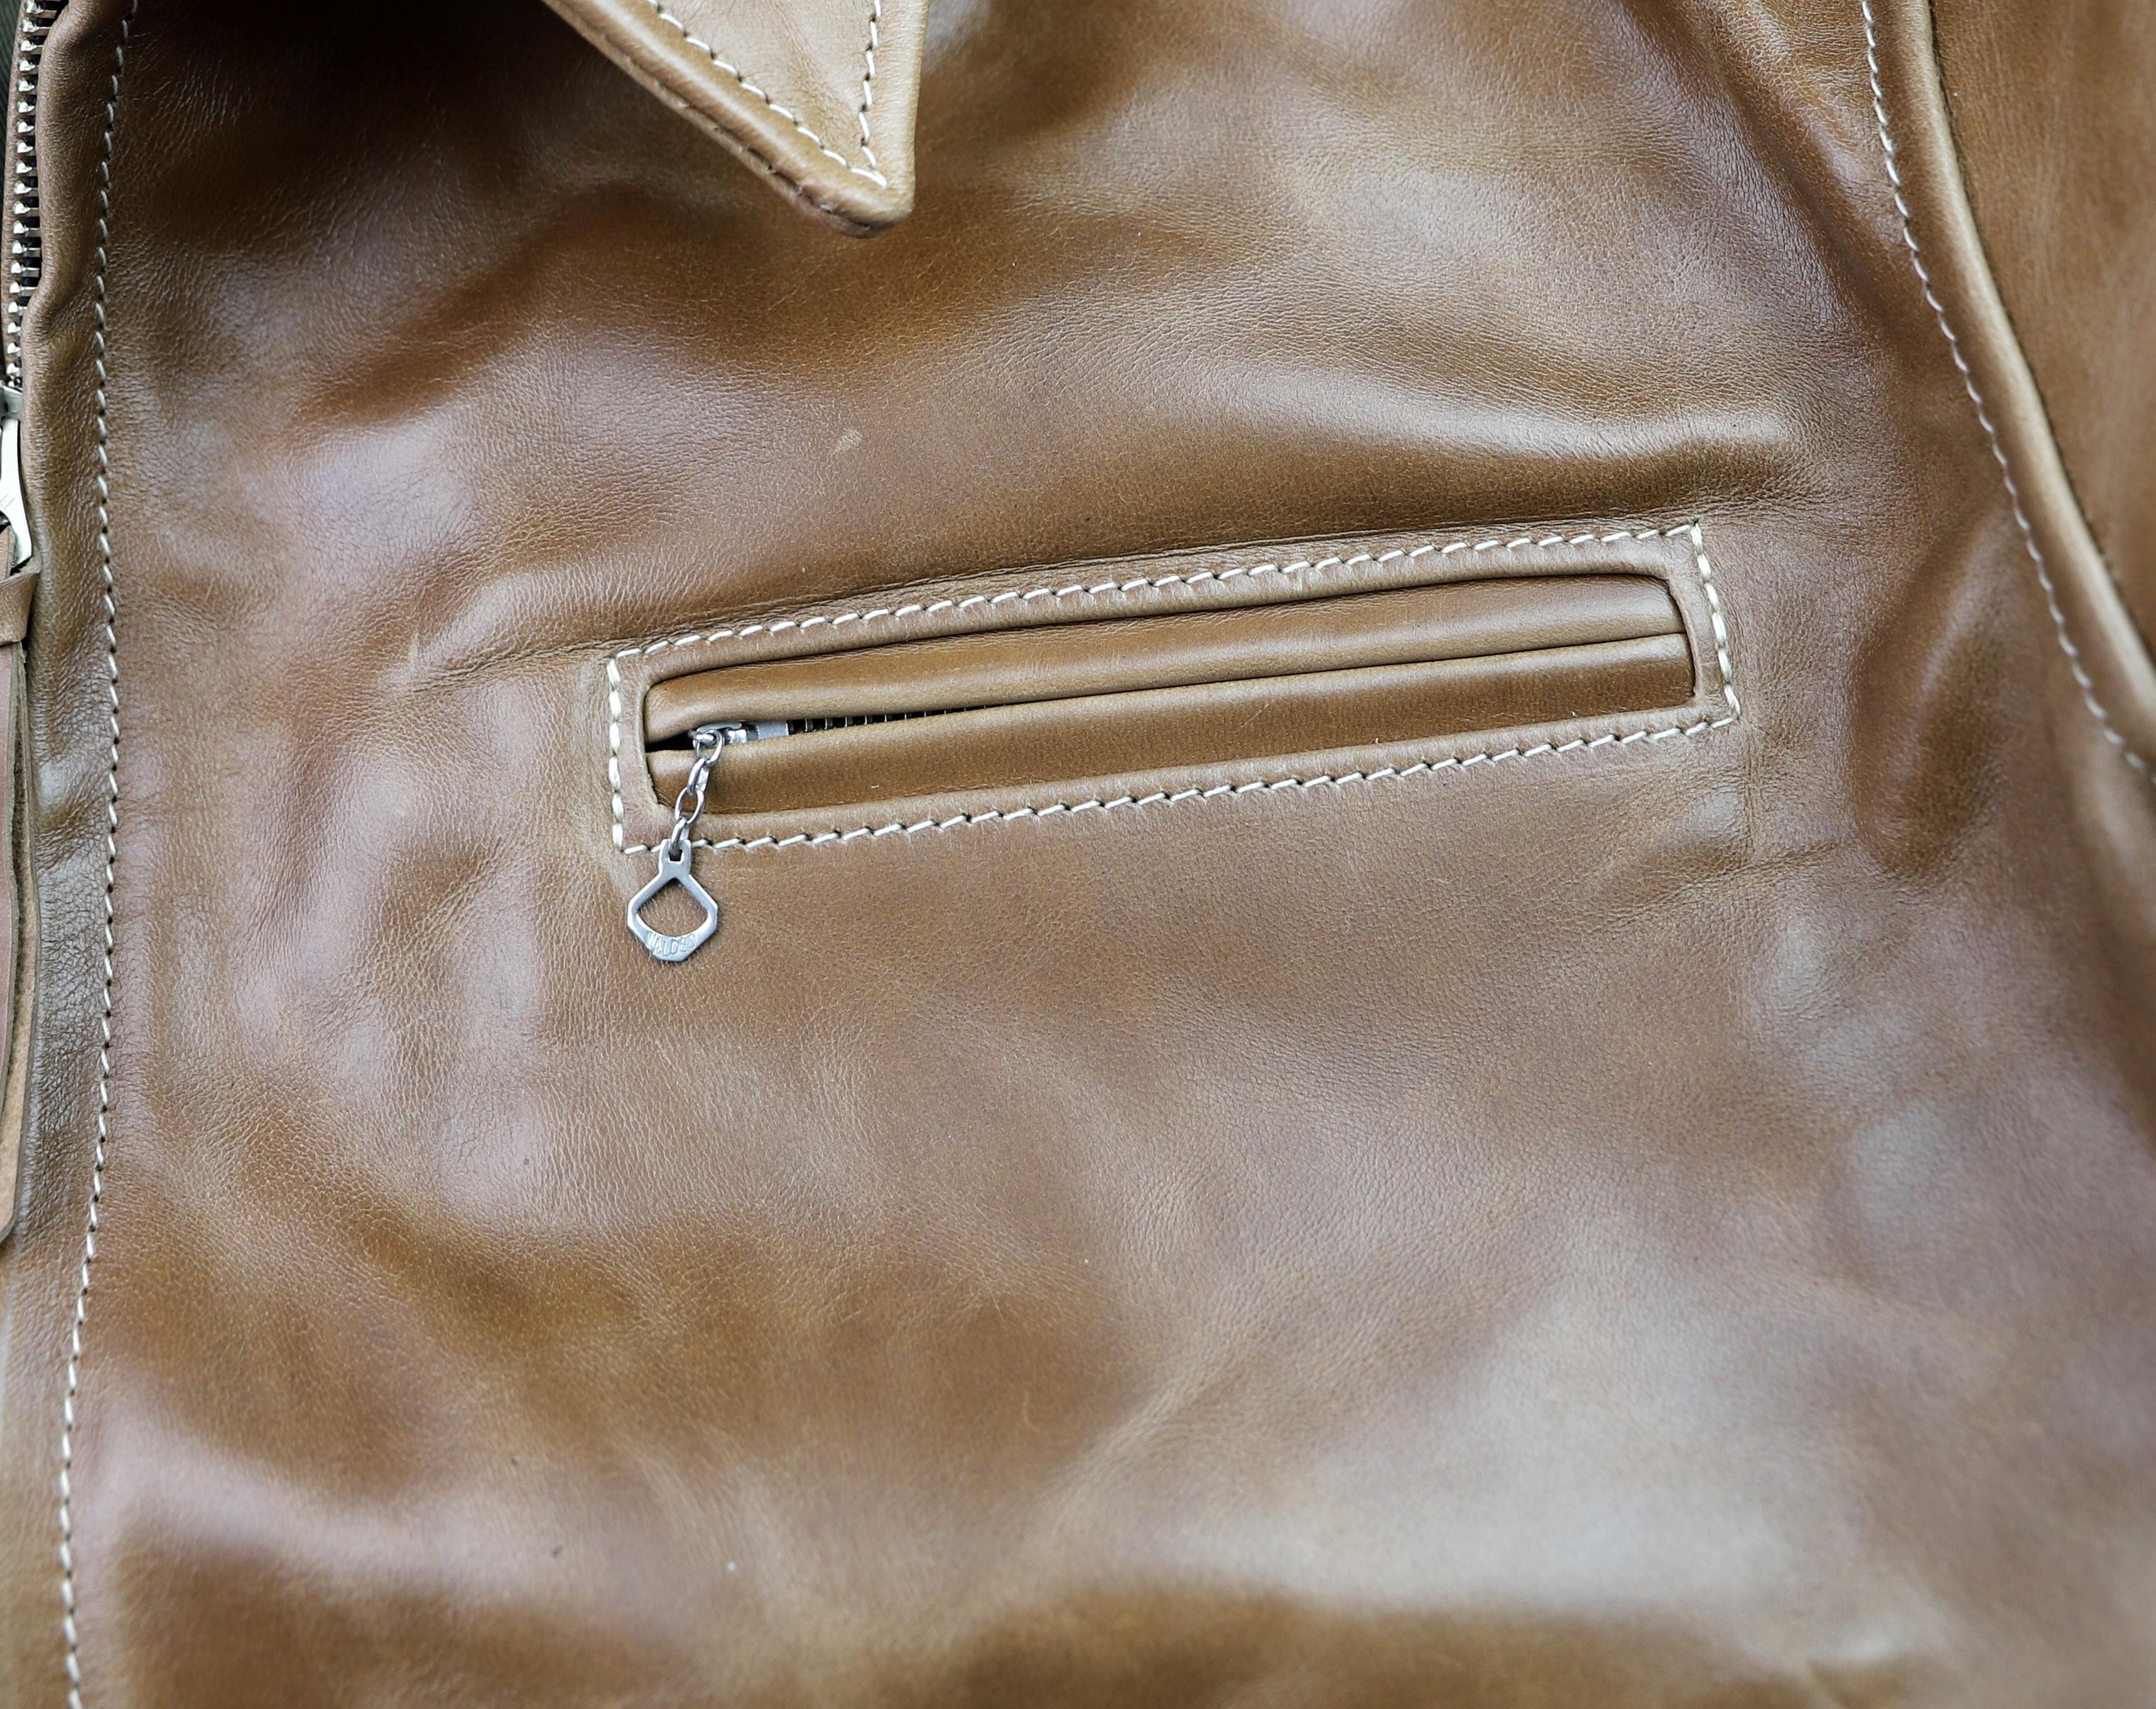 Aero Sheene Natural CXL FQHH DKB chest pocket.jpg